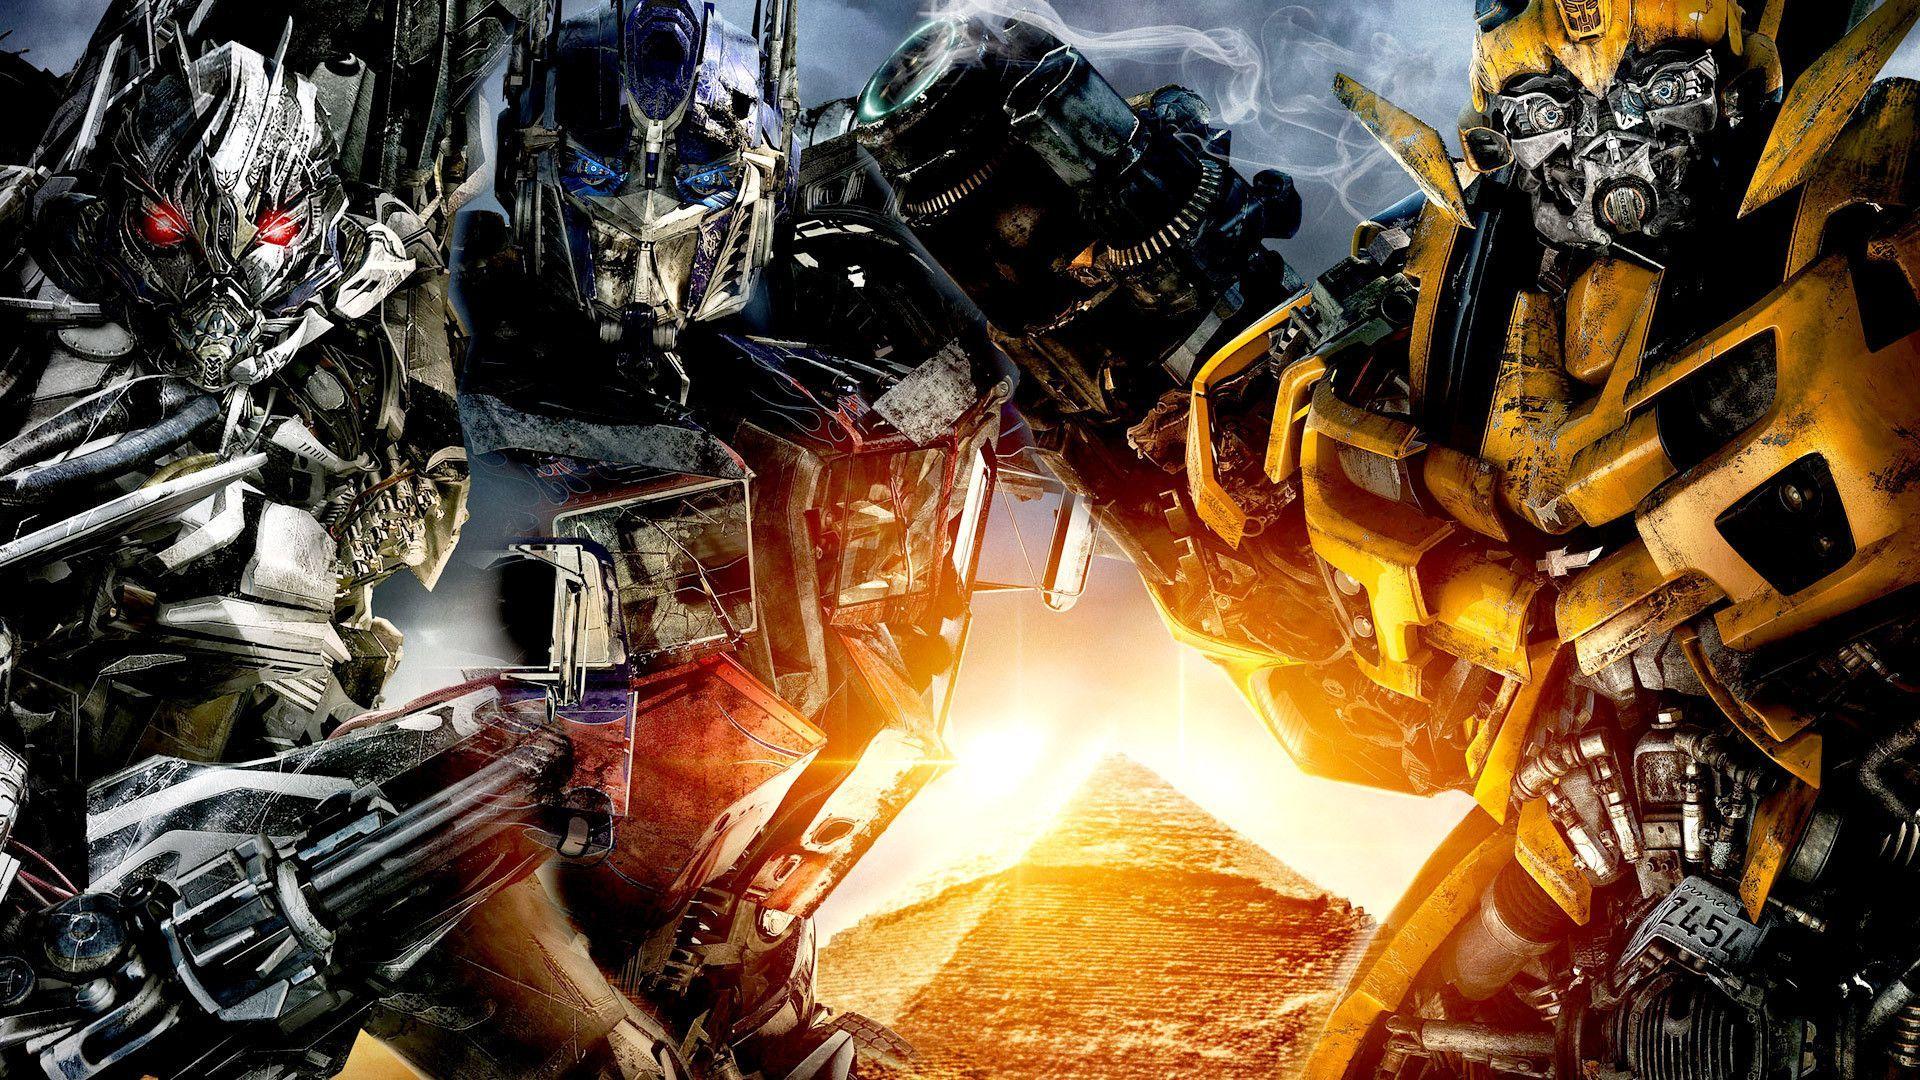 Bumblebee And Optimus Wallpaper 3d Image Num 29